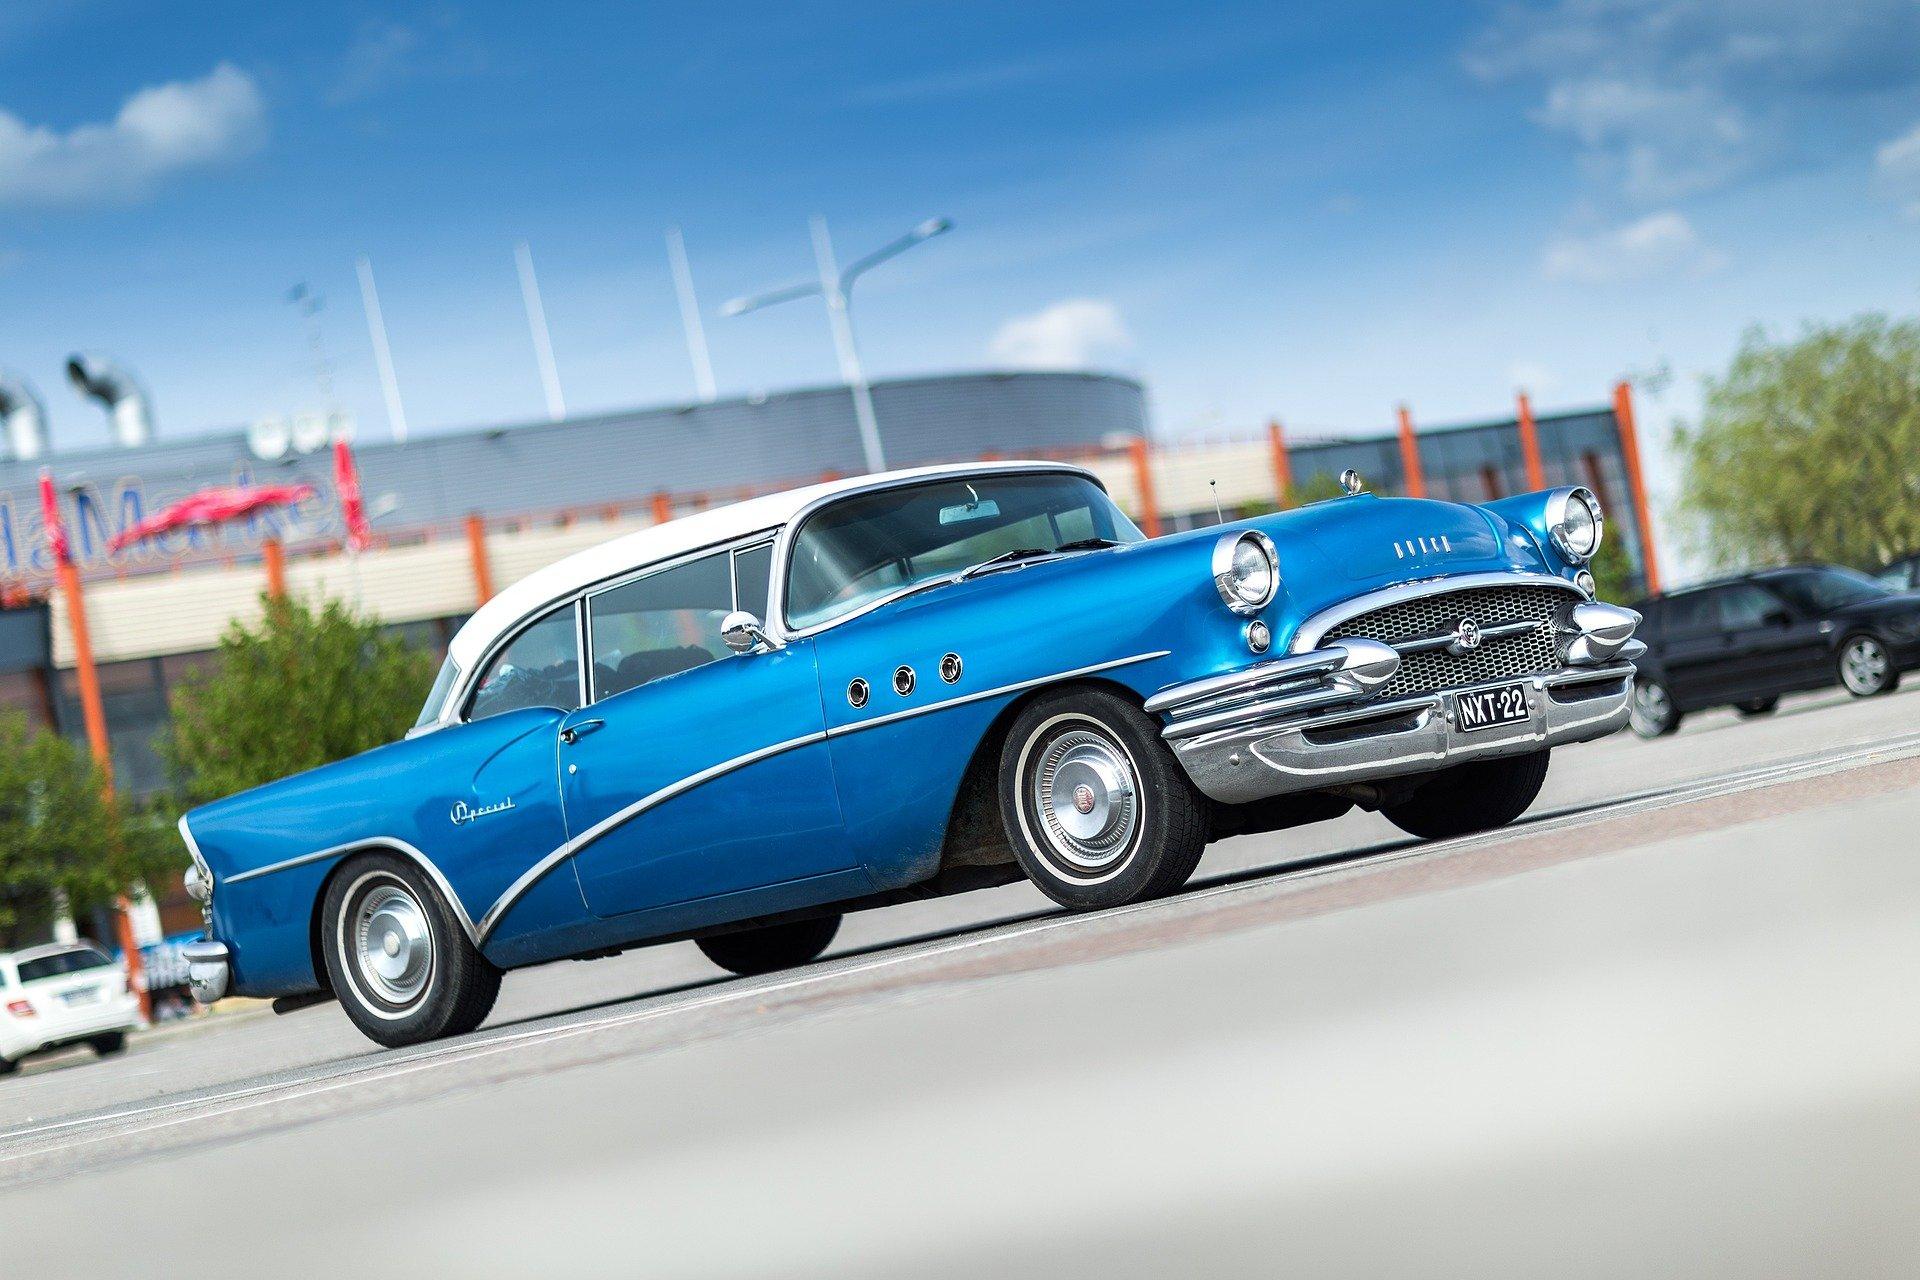 buick 1400243 1920 15. Juni 2021